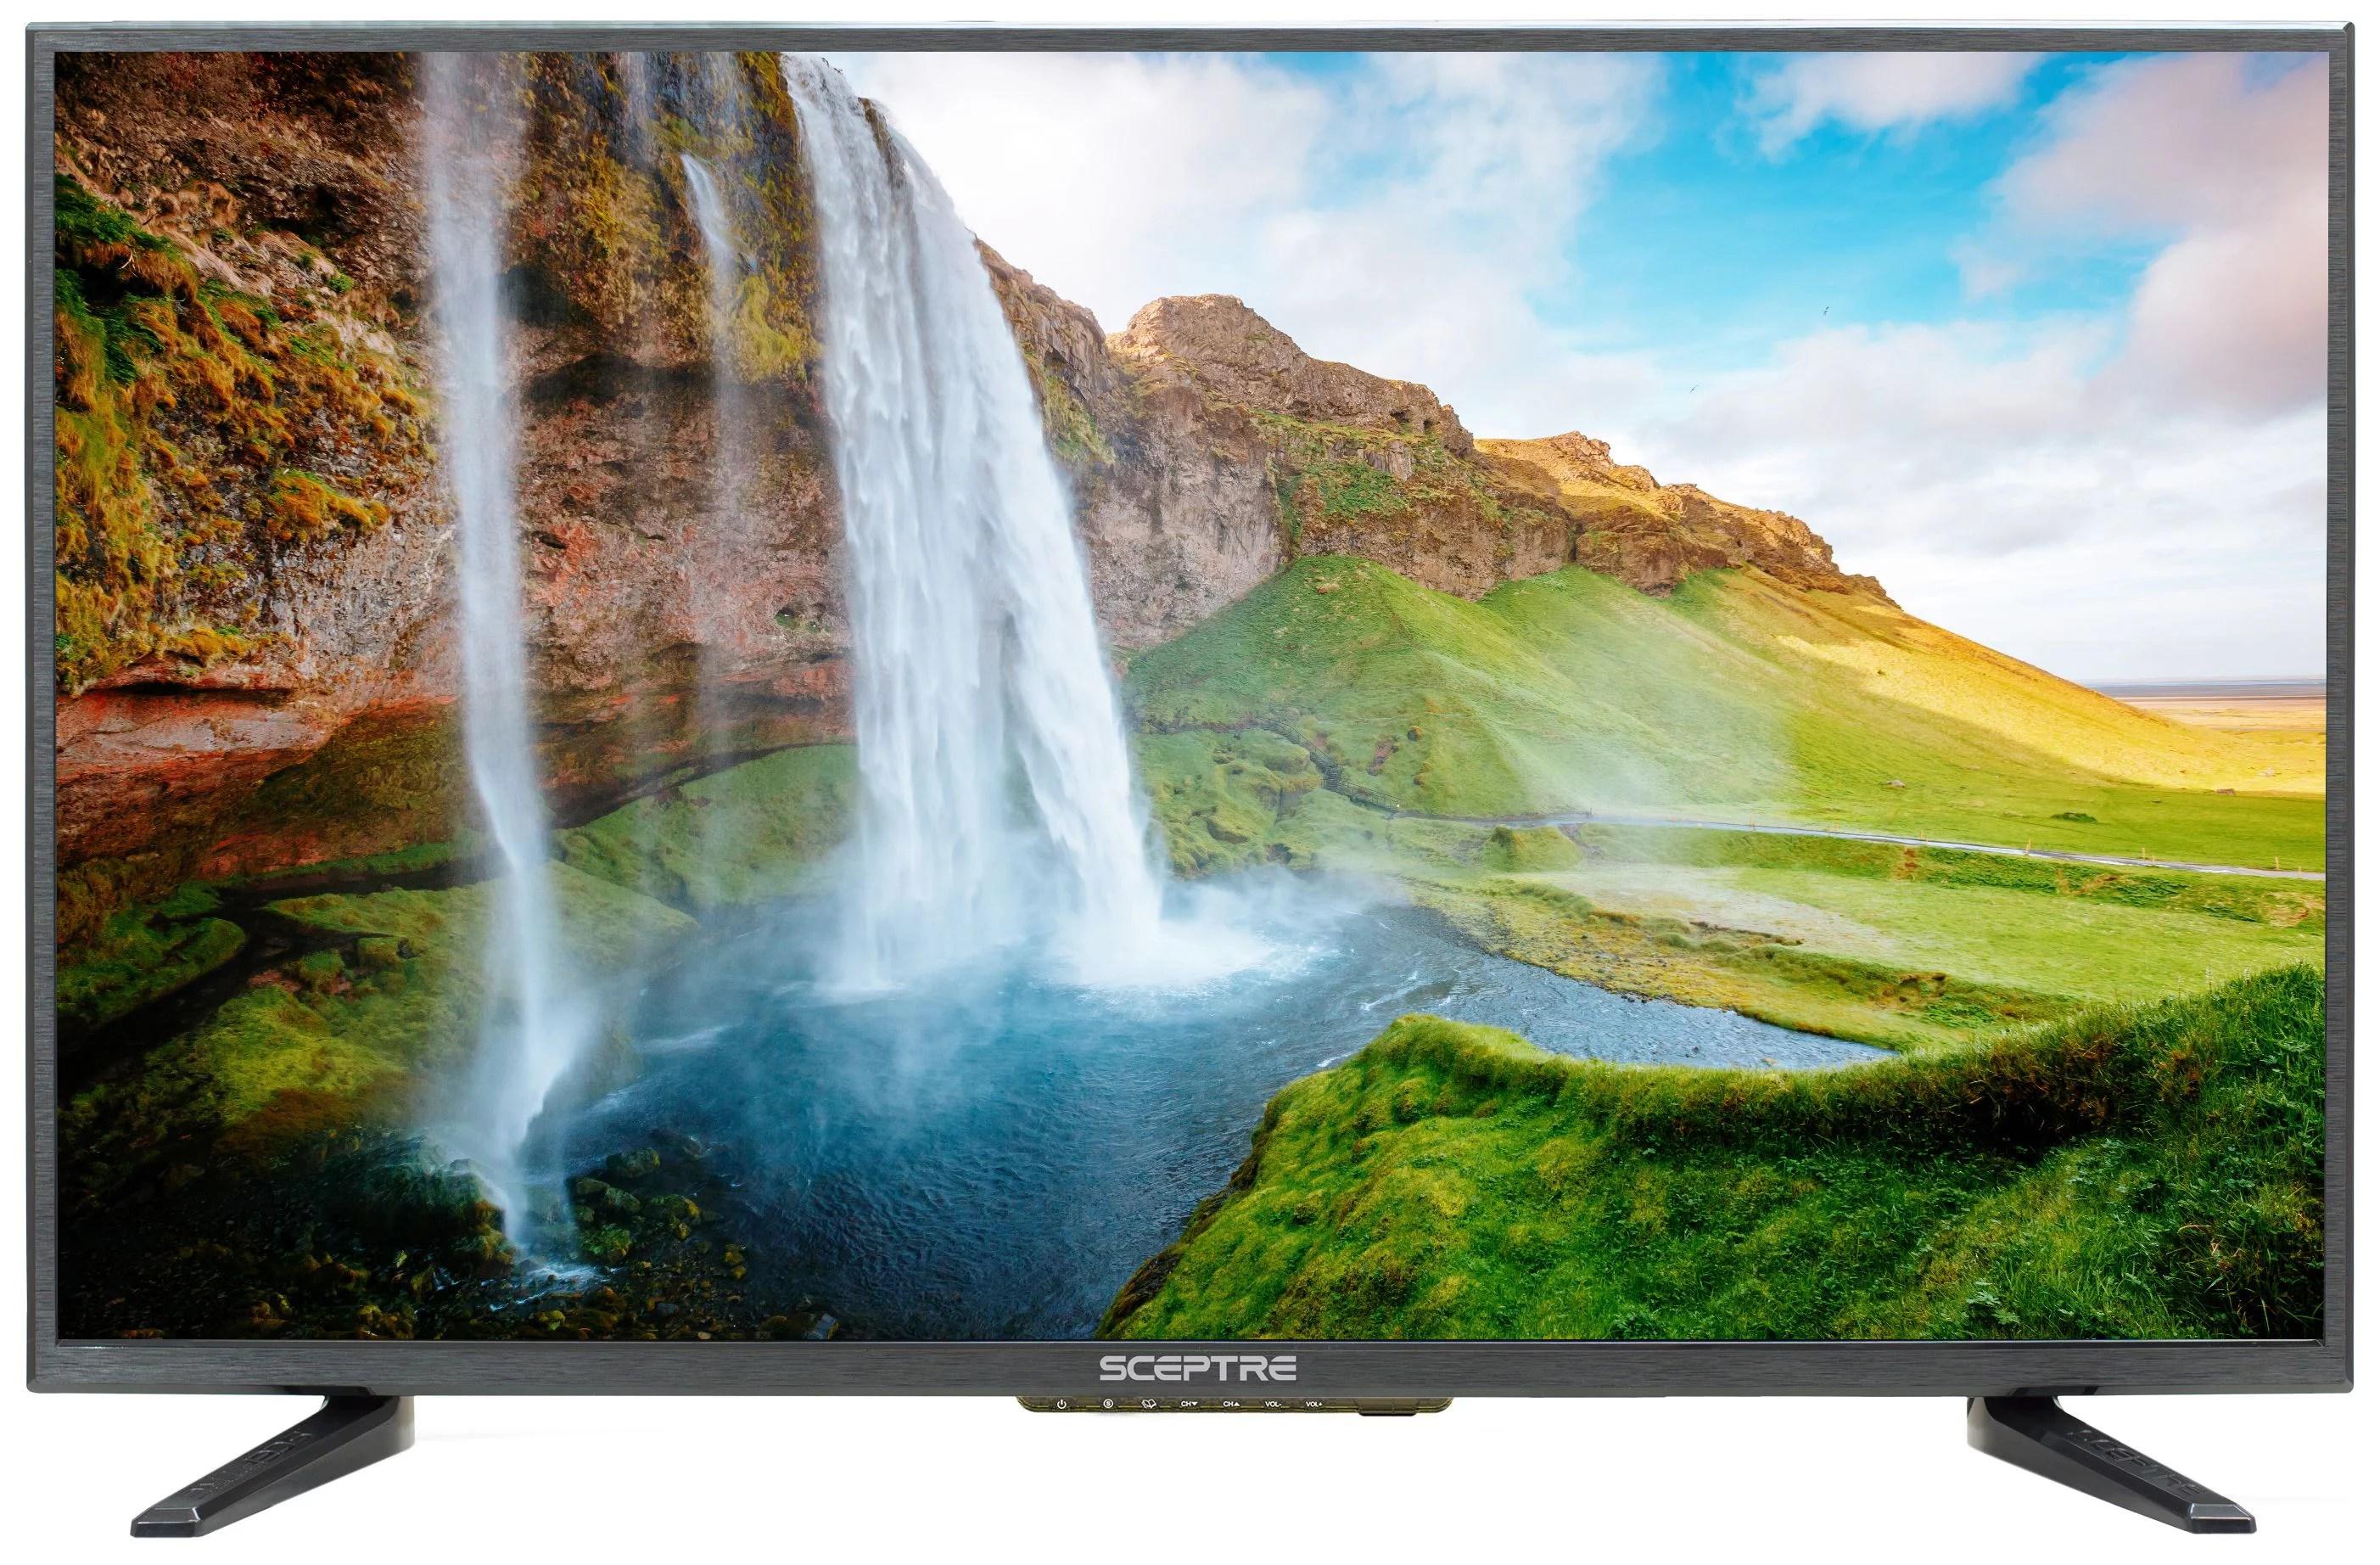 sceptre 32 class 720p hd led tv x322bv sr walmart com